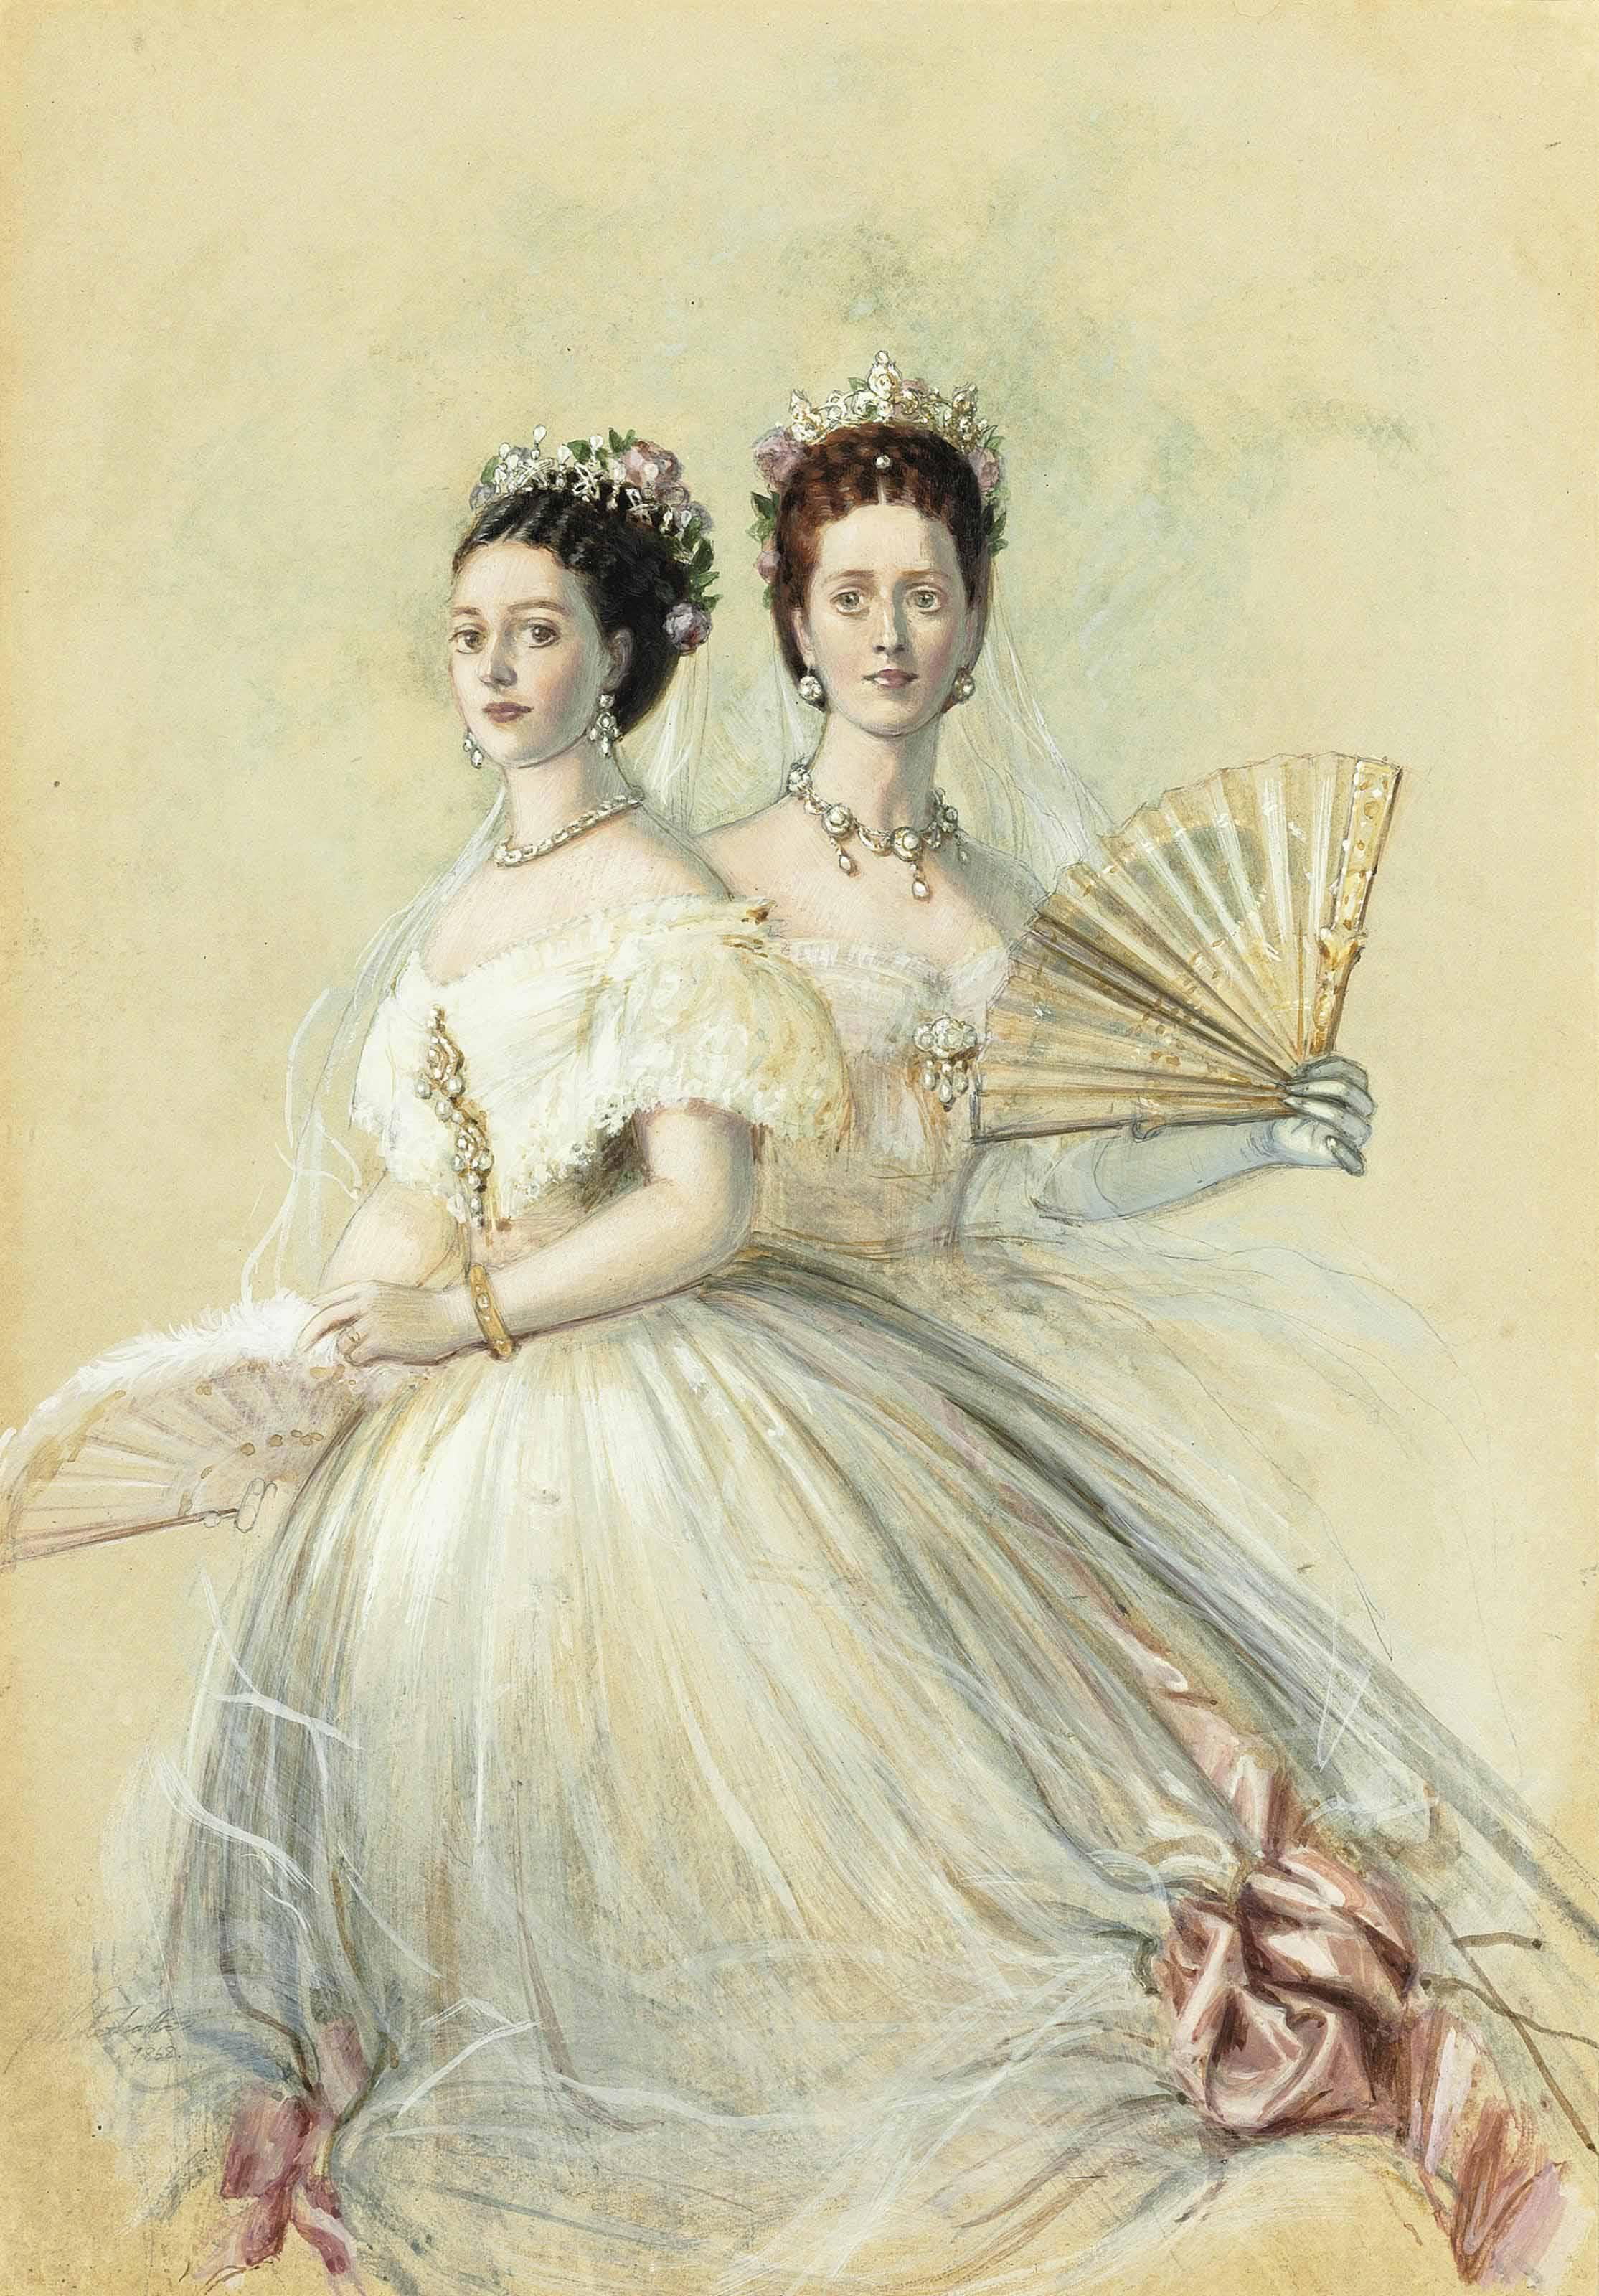 Portrait of Czarina Maria Feodorovna and her sister Alexandra, Princess of Wales